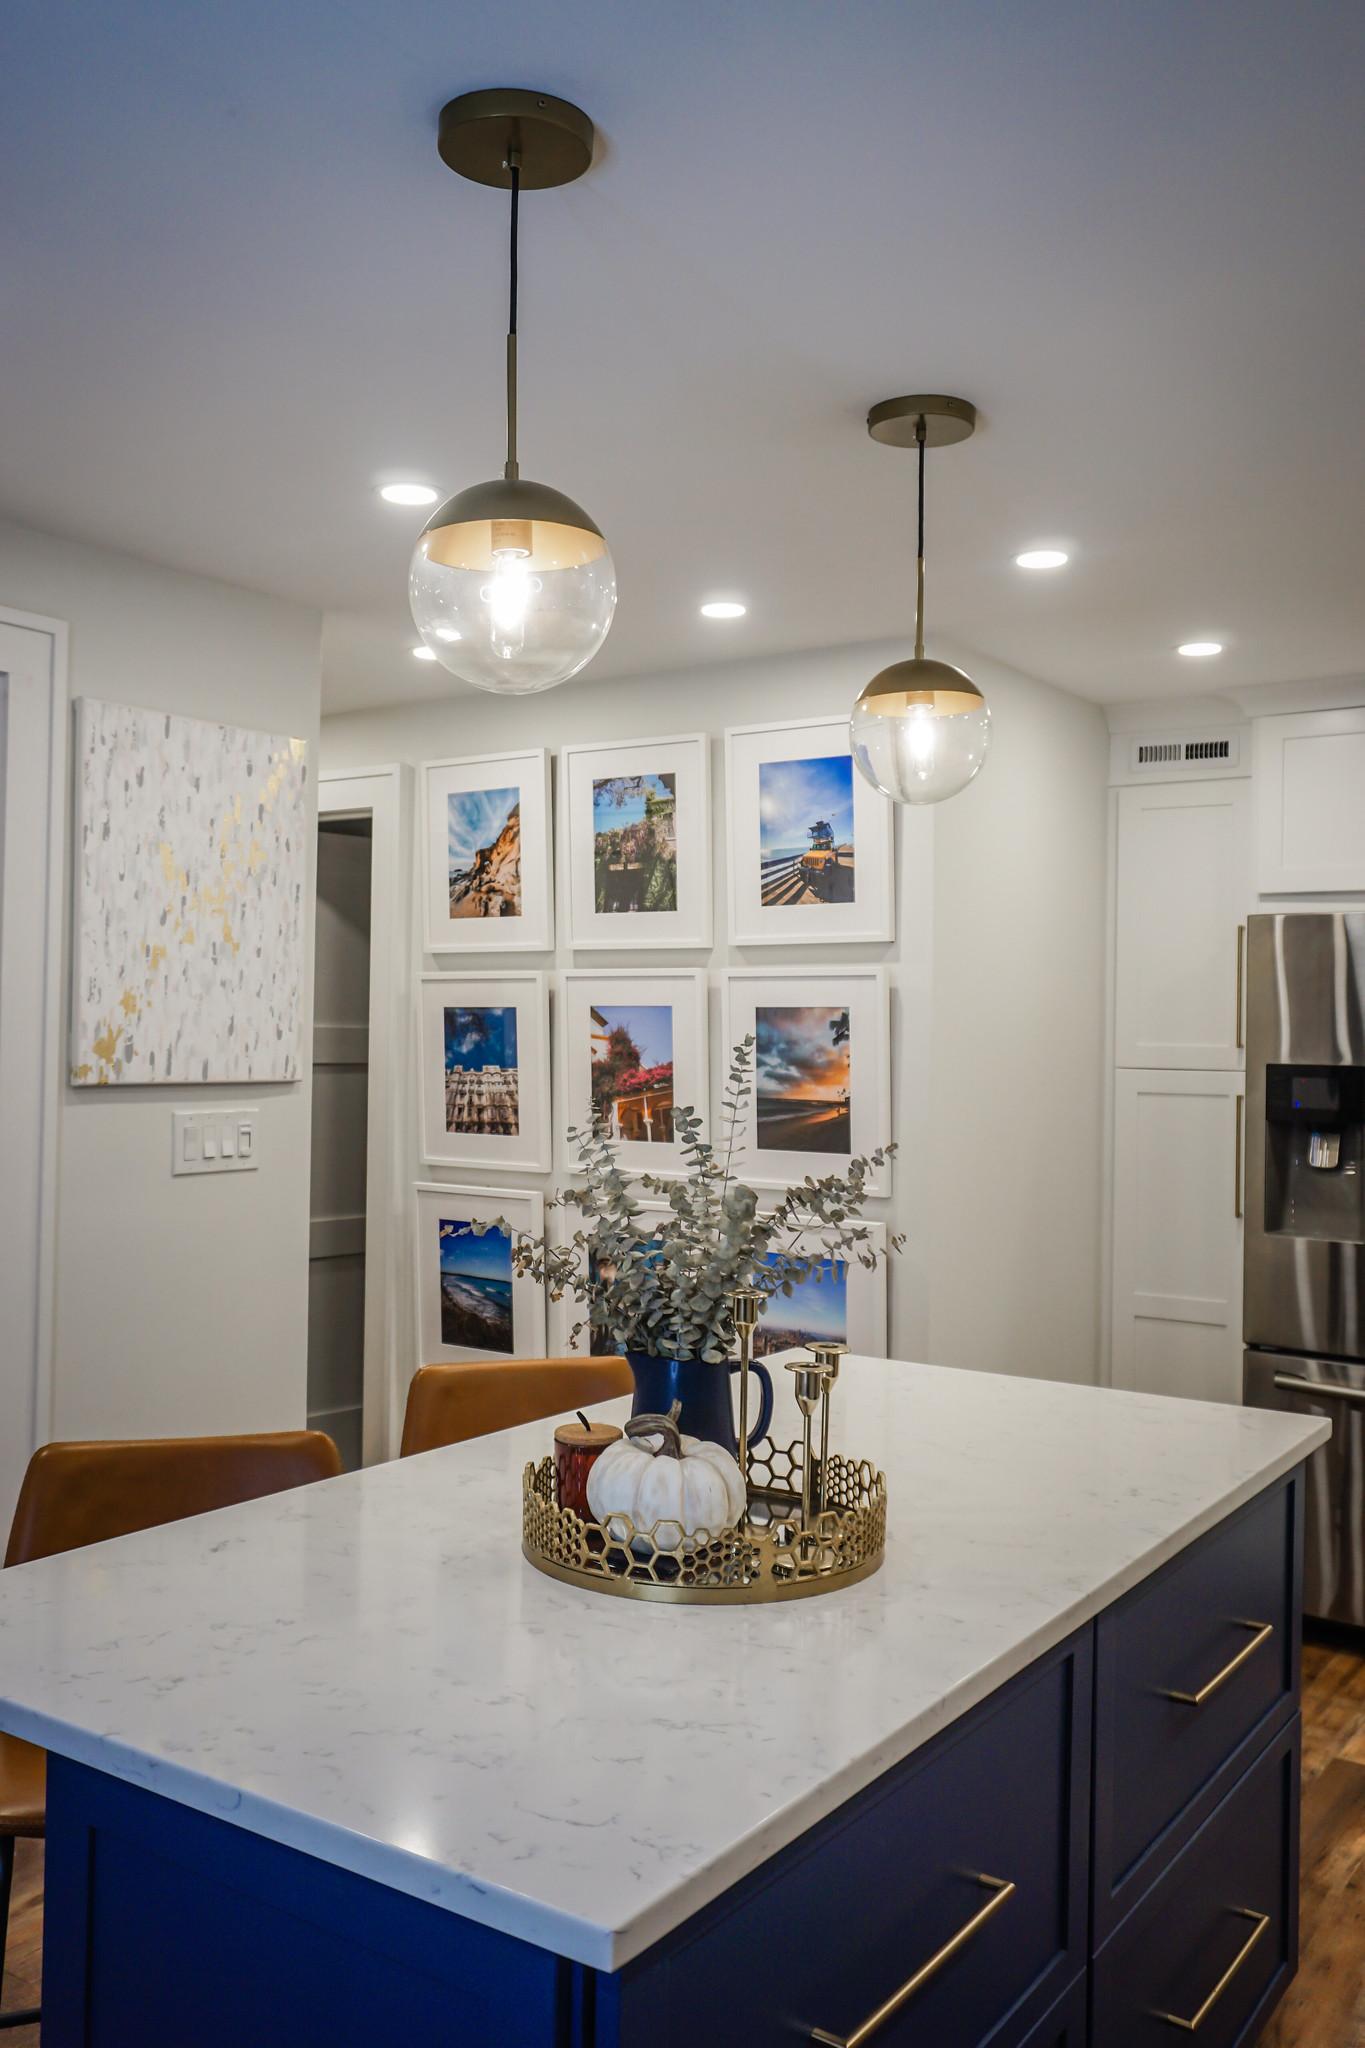 Kitchen Island Fall Decorations | White Pumpkin and Eucalyptus | Kitchen Gallery Wall